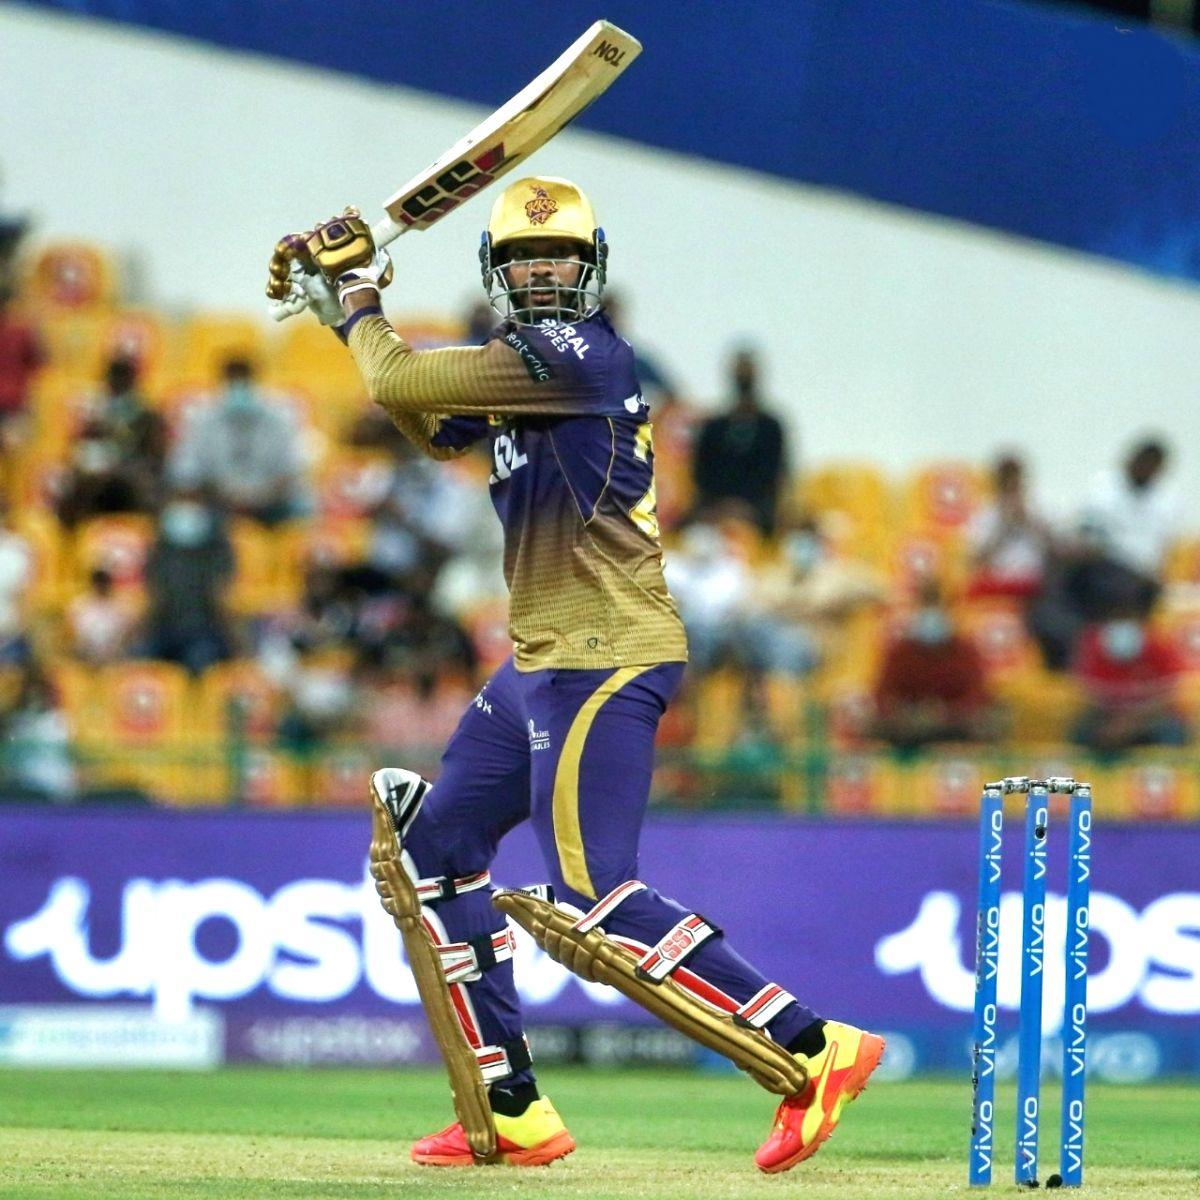 IPL 2021: Iyer, Tripathi guide Kolkata to a comprehensive win over Mumbai